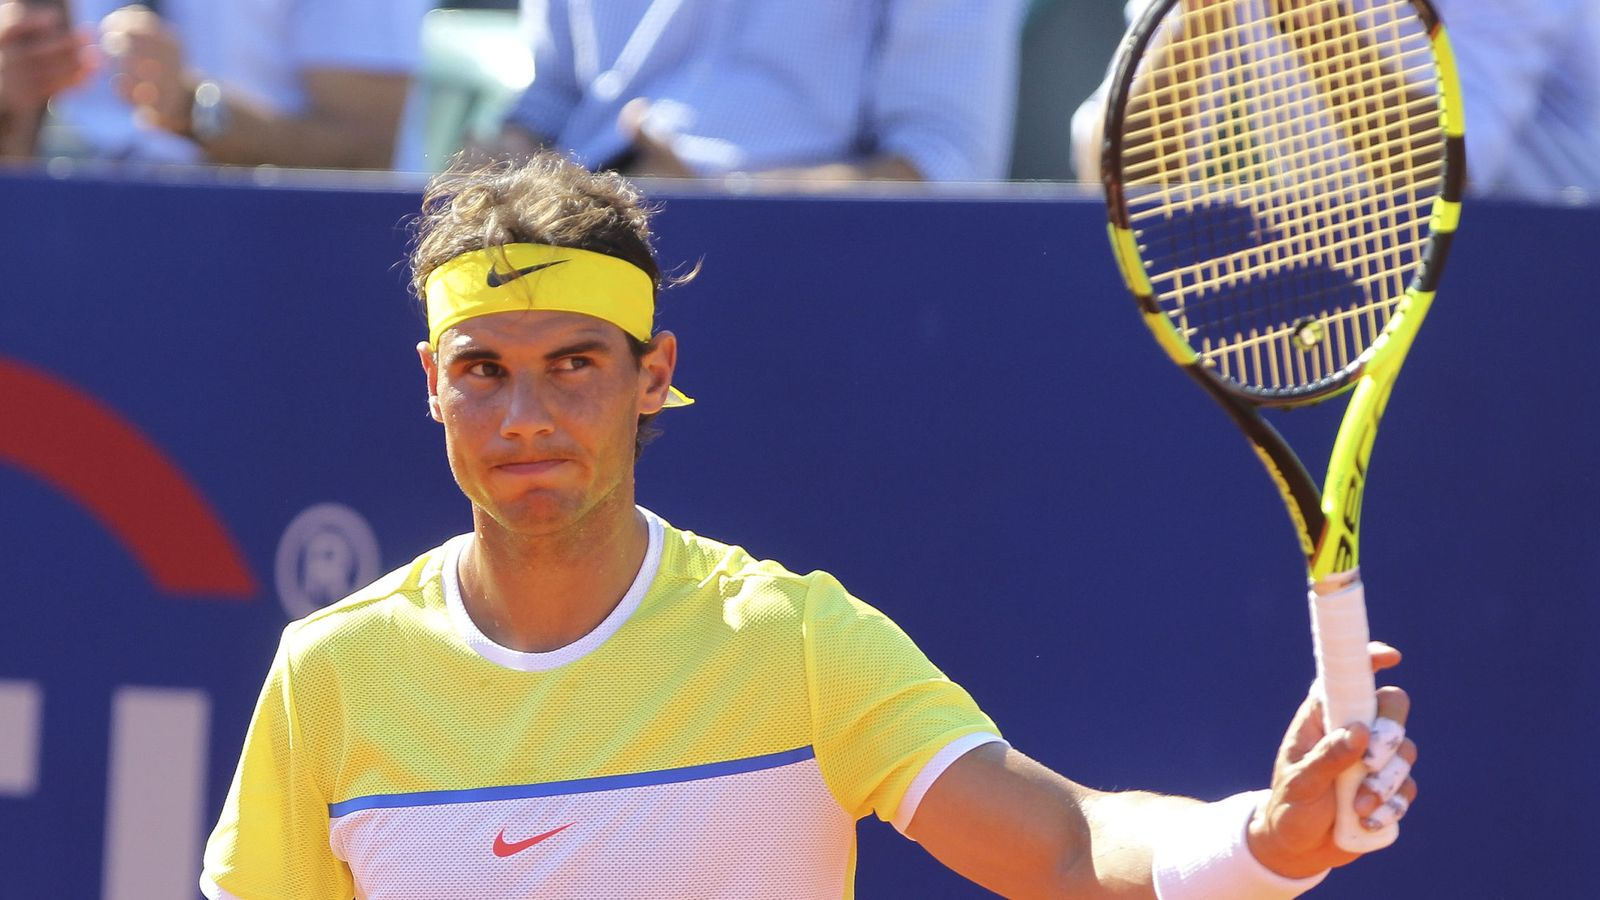 Foto: Rafa Nadal en su partido ante Paolo Lorenzi (Efe).